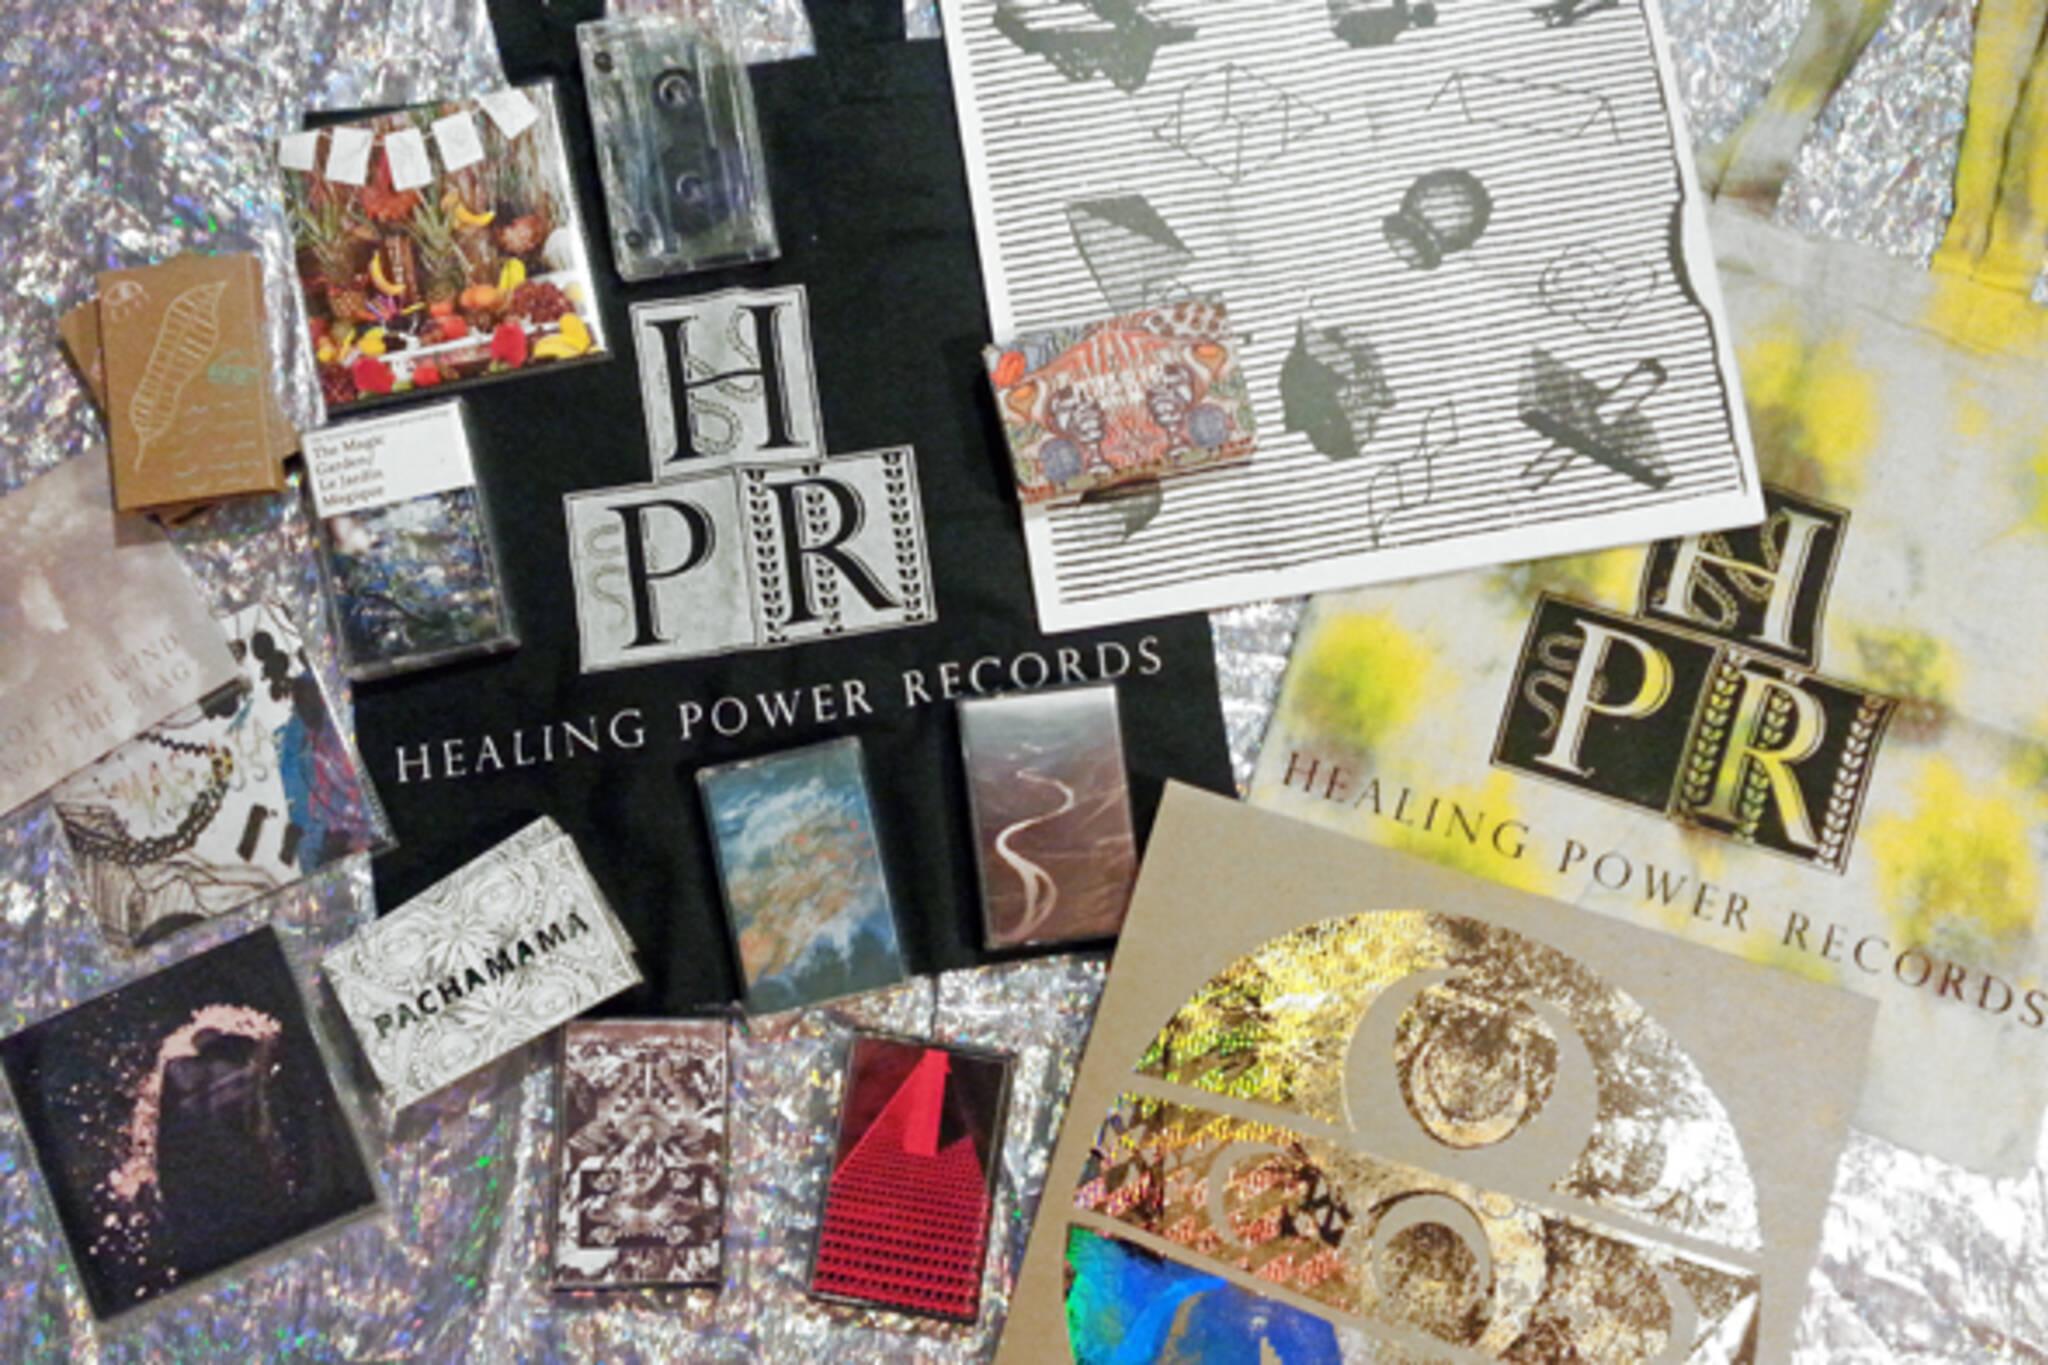 Healing Power Records